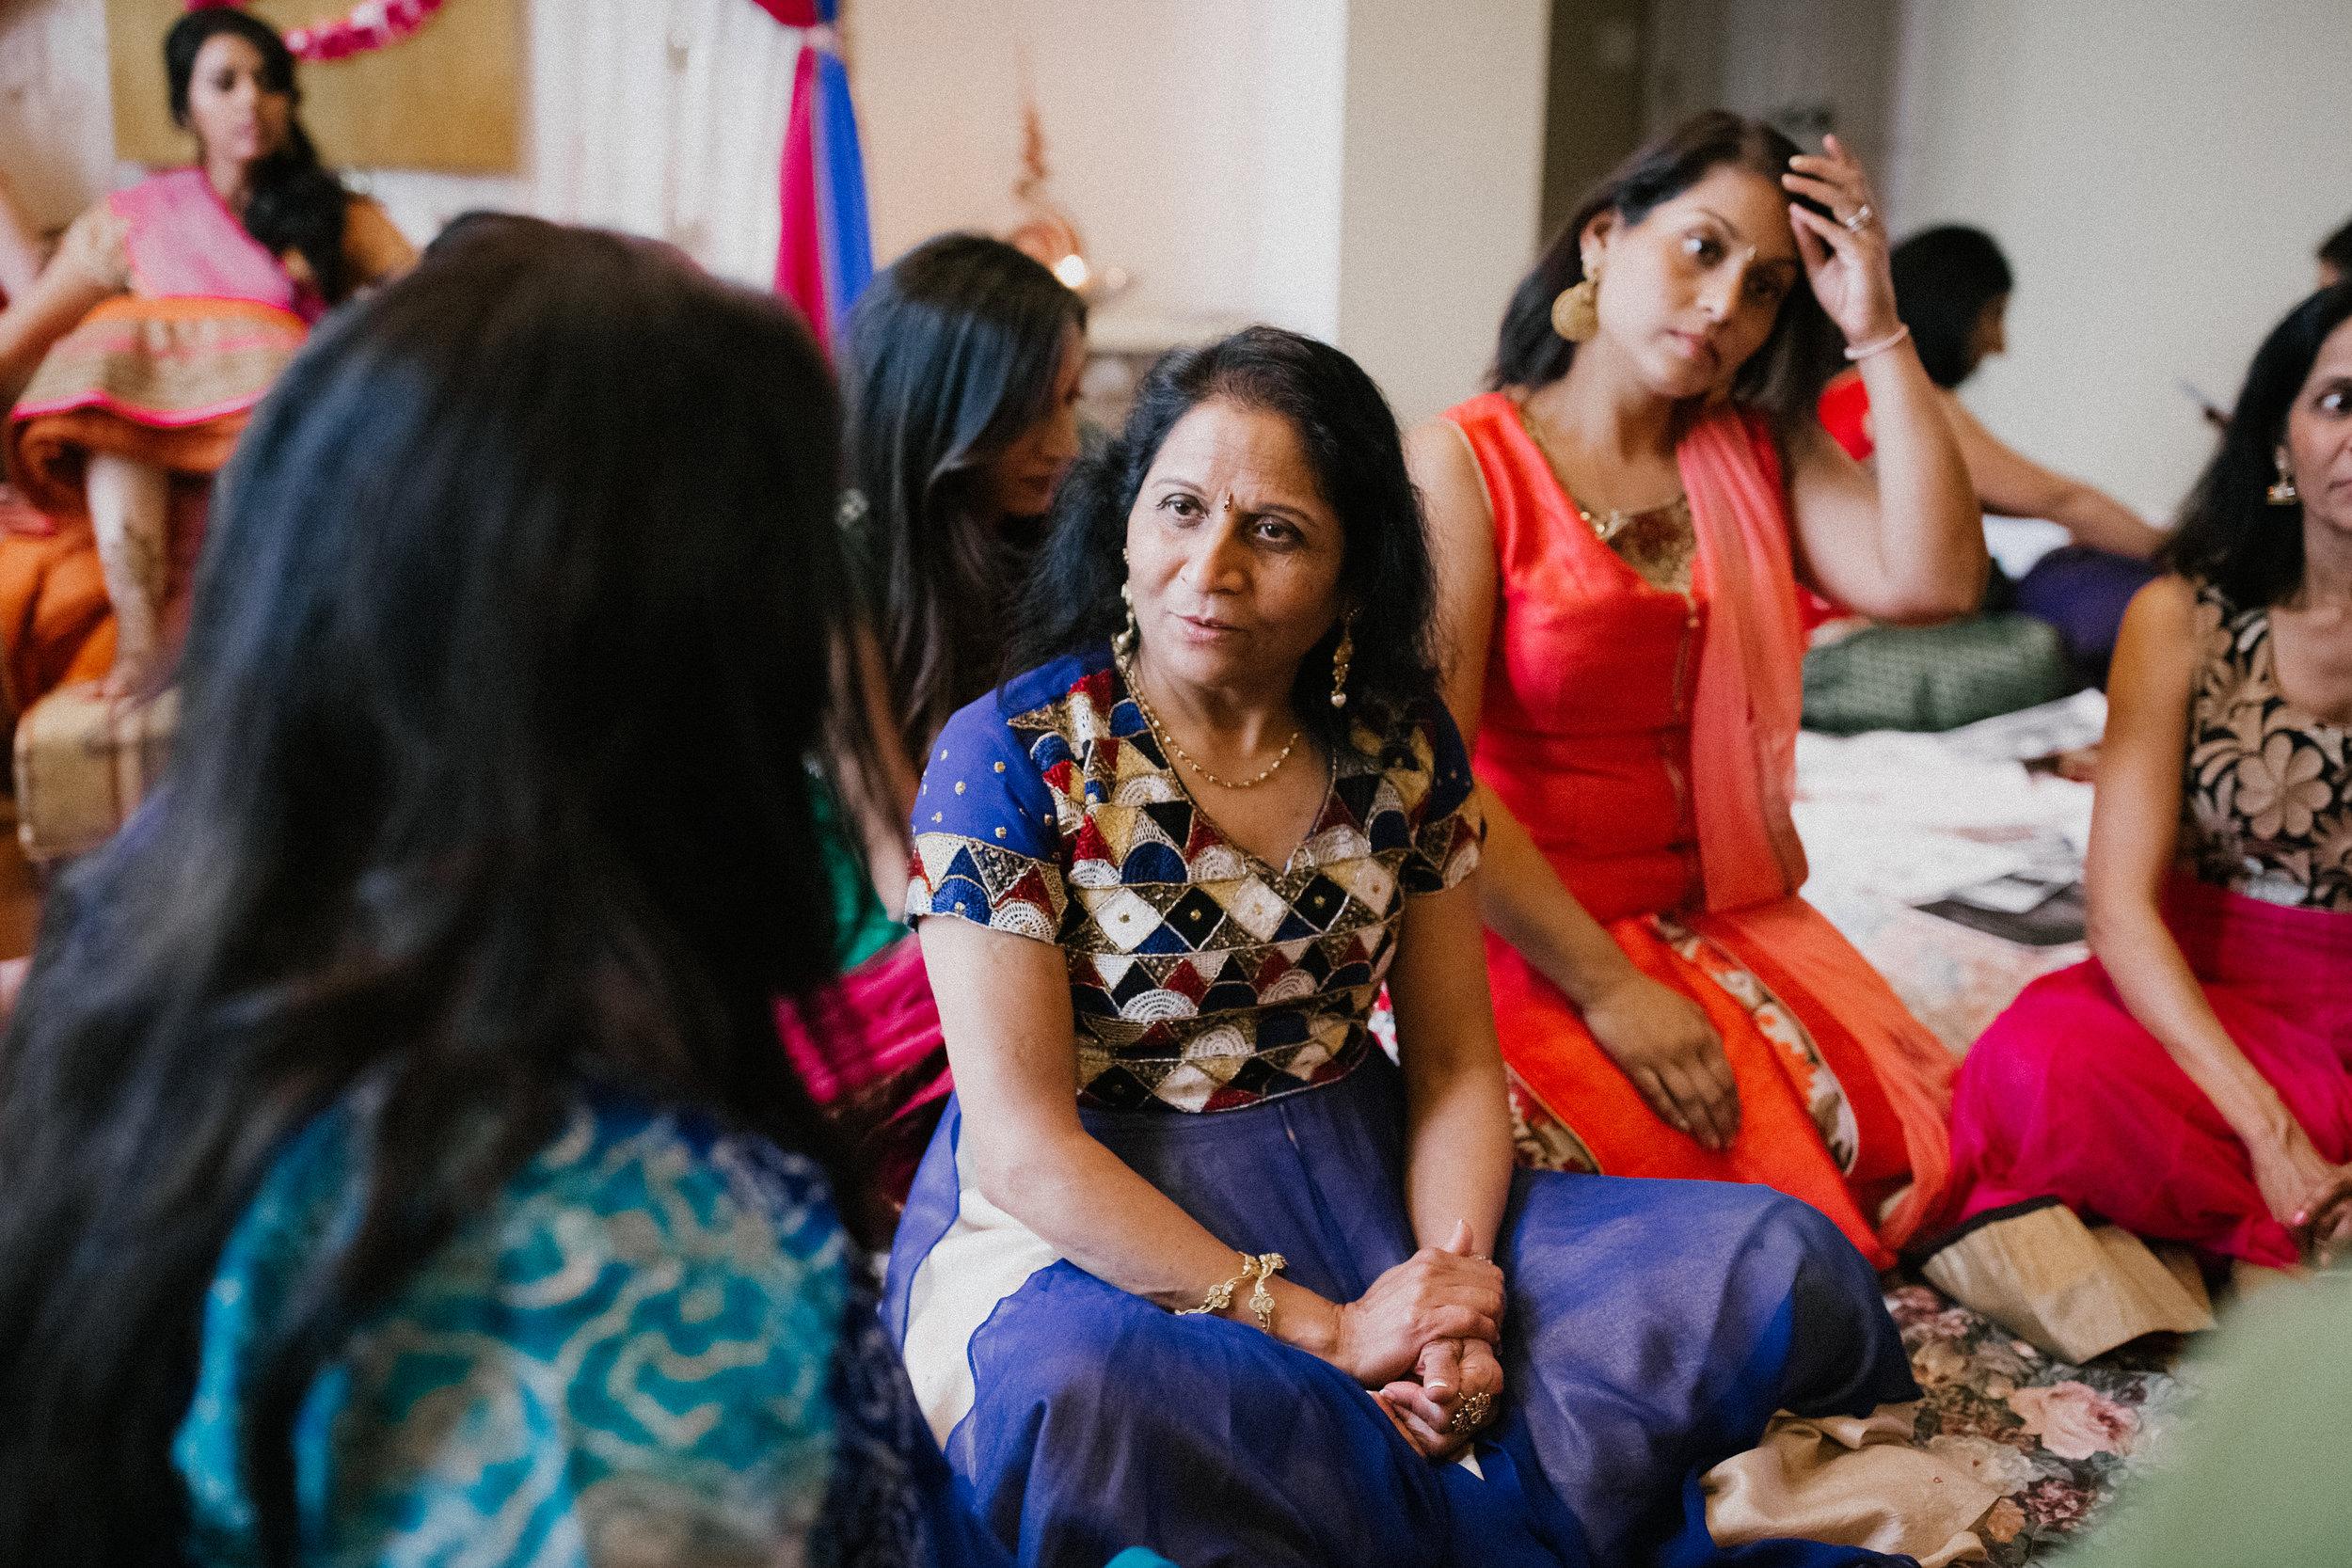 Aparna-Ankit-Patel-Mehndi-Wedding-Photos-0044.jpg